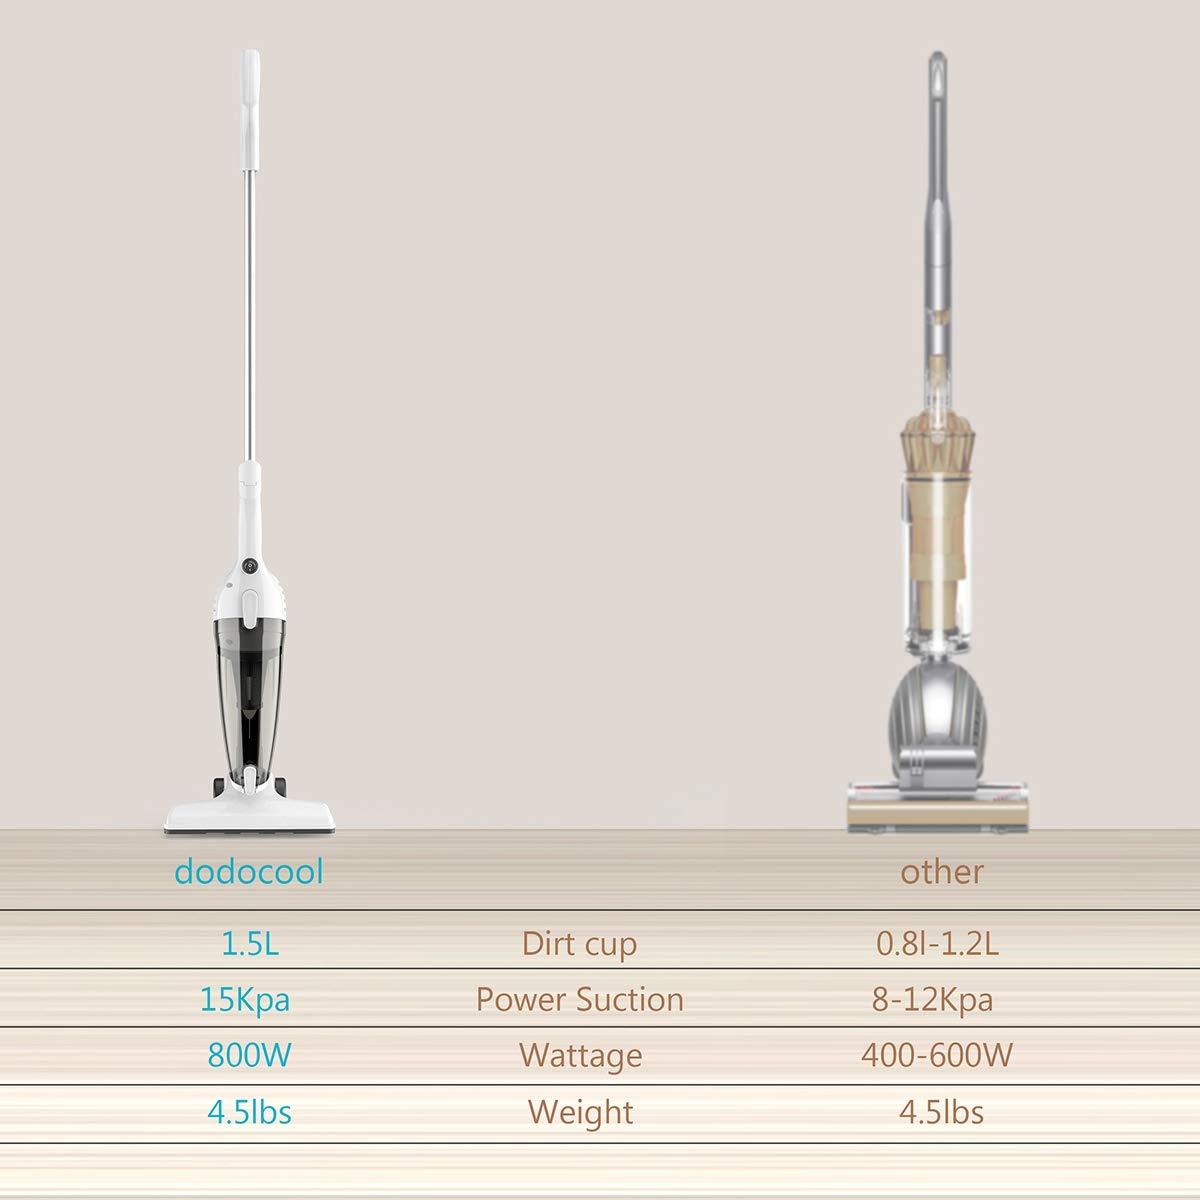 Swivel Ultra Lightweight Stick Vacuum,15 KPa 800W Strong Suction Handheld Stick Versatile Vacuum Cleaner Bagless for Floor Carpet Car Pet Hair dodocool 2 in 1 Corded Vacuum Cleaner